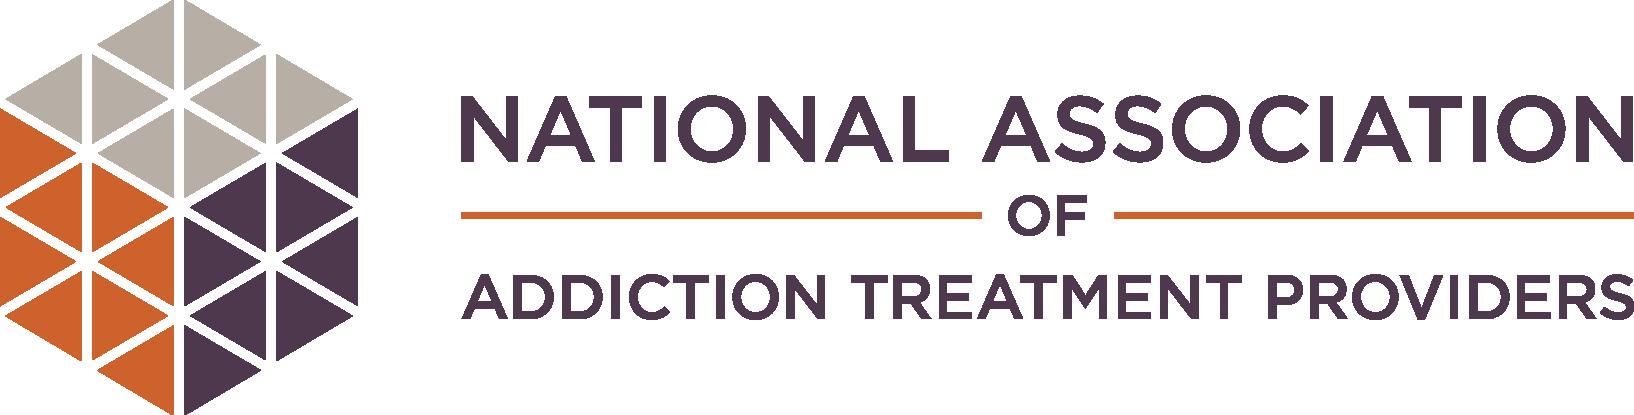 NAATP-logo